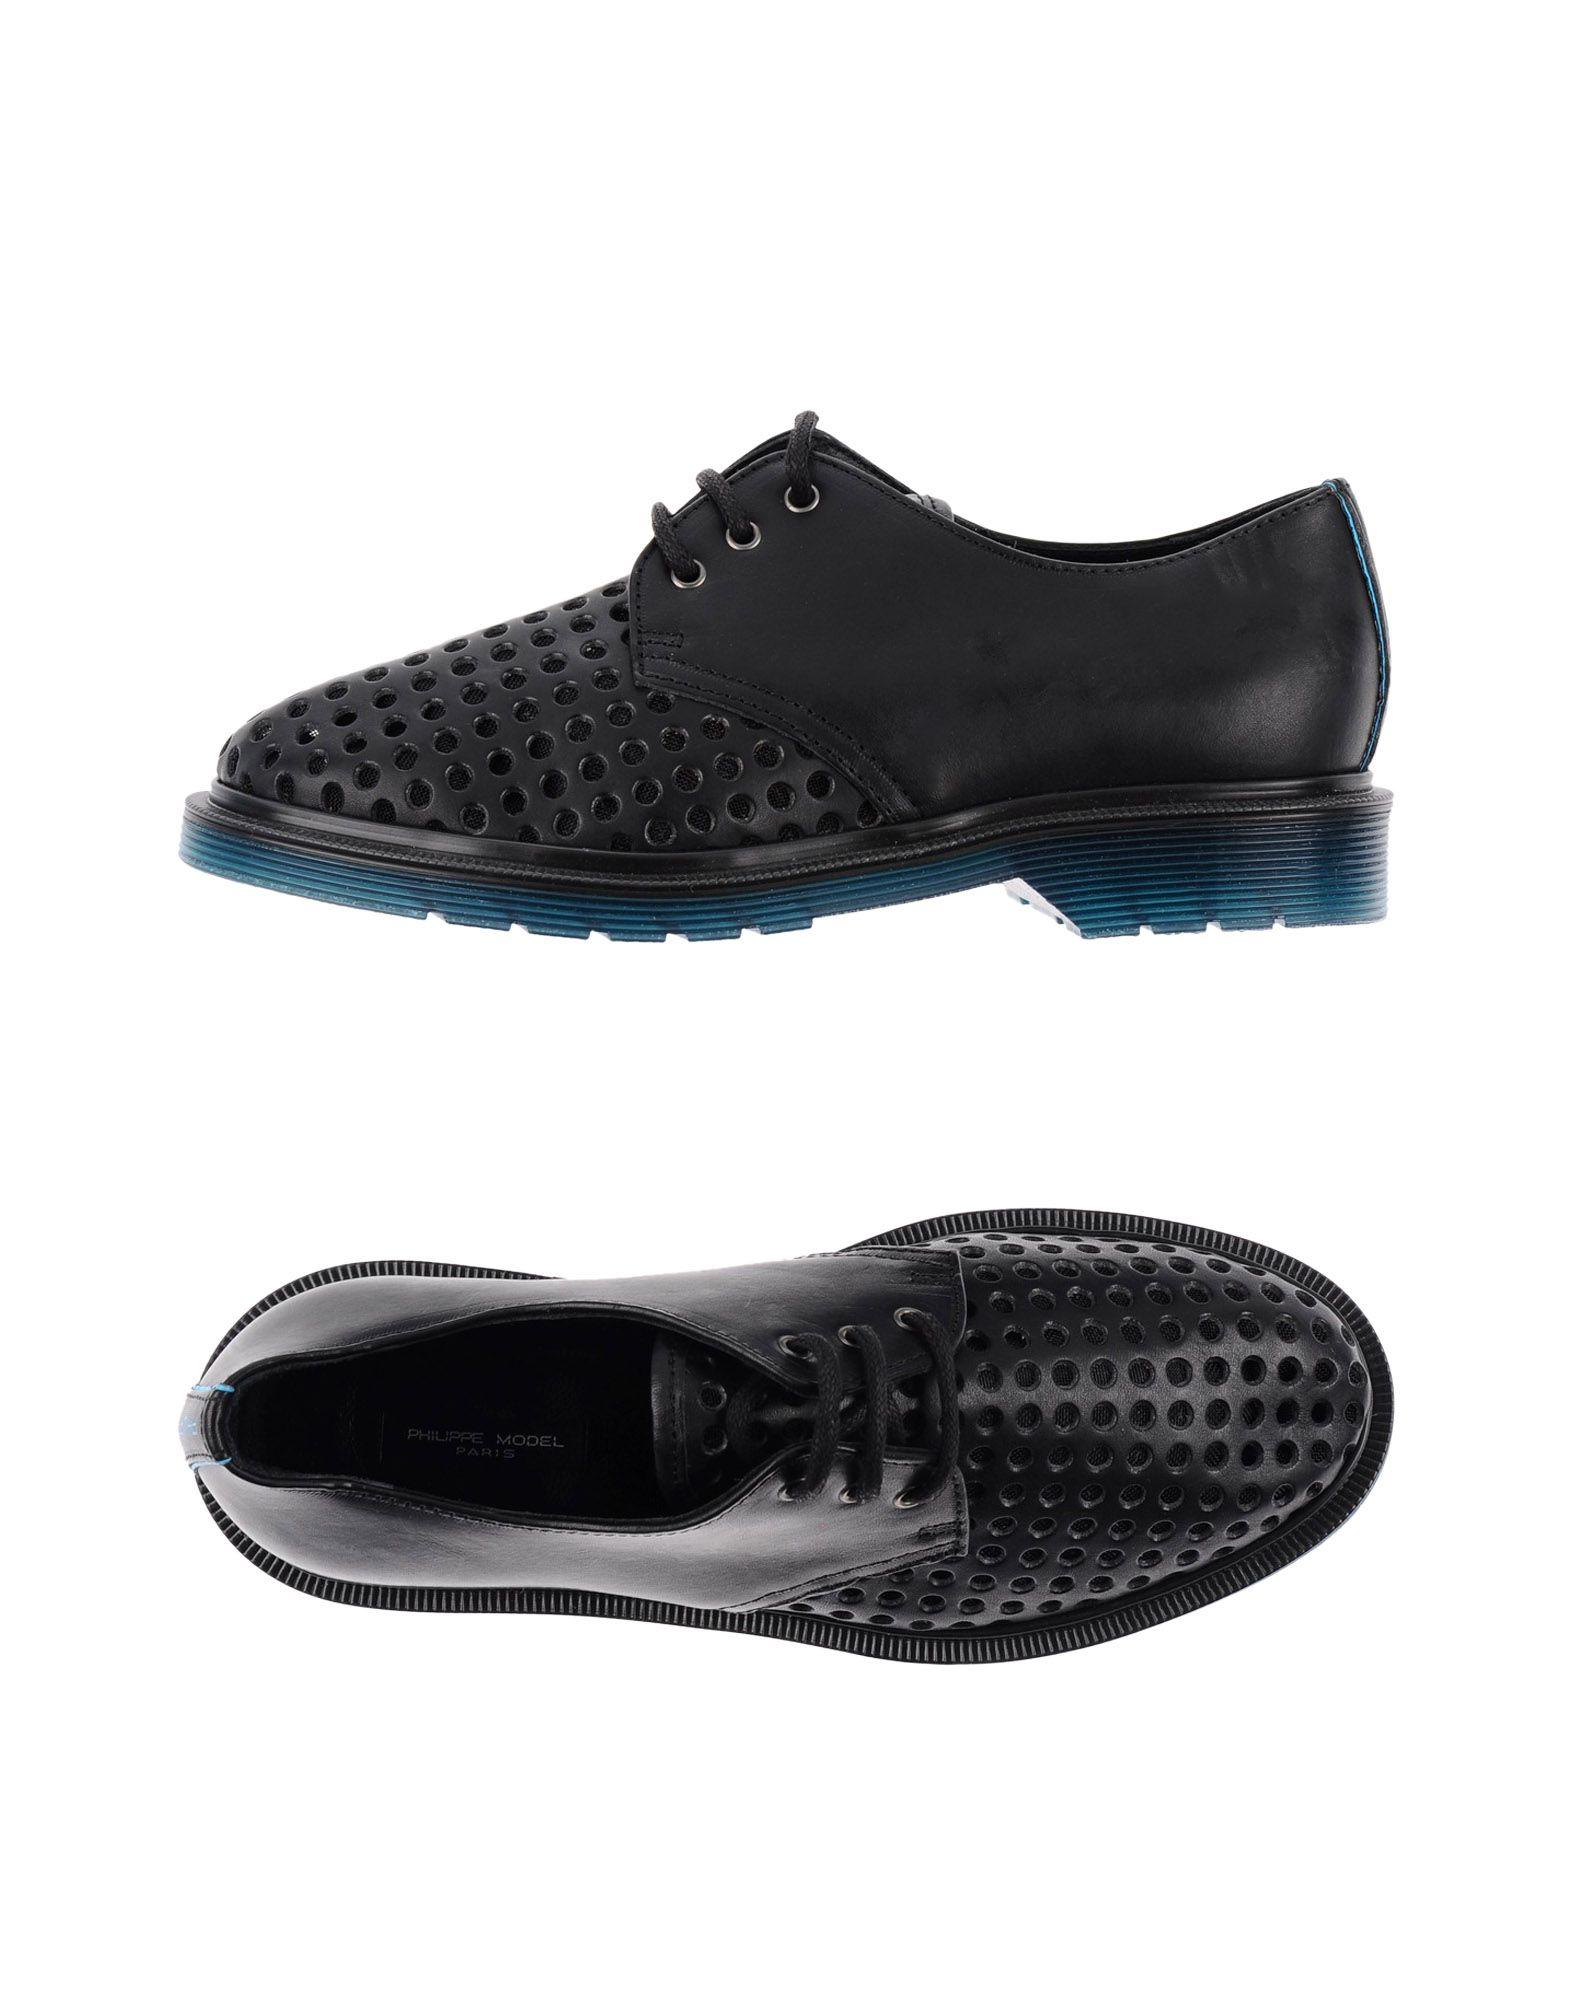 Philippe Model Schnürschuhe Damen  11343062OQ Gute Qualität beliebte Schuhe